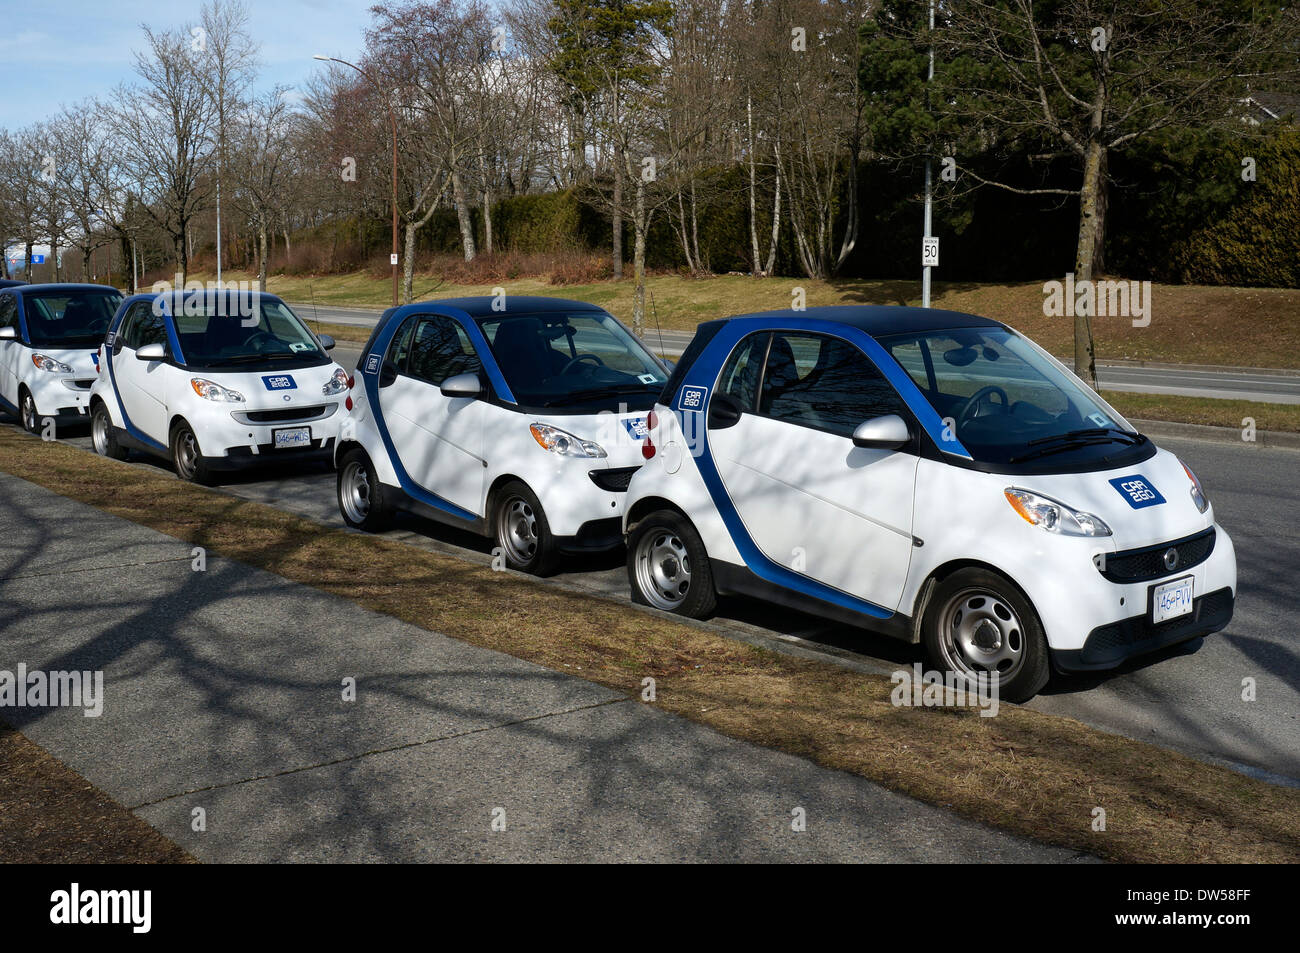 car-2go-car-sharing-smart-cars-fortwo-li